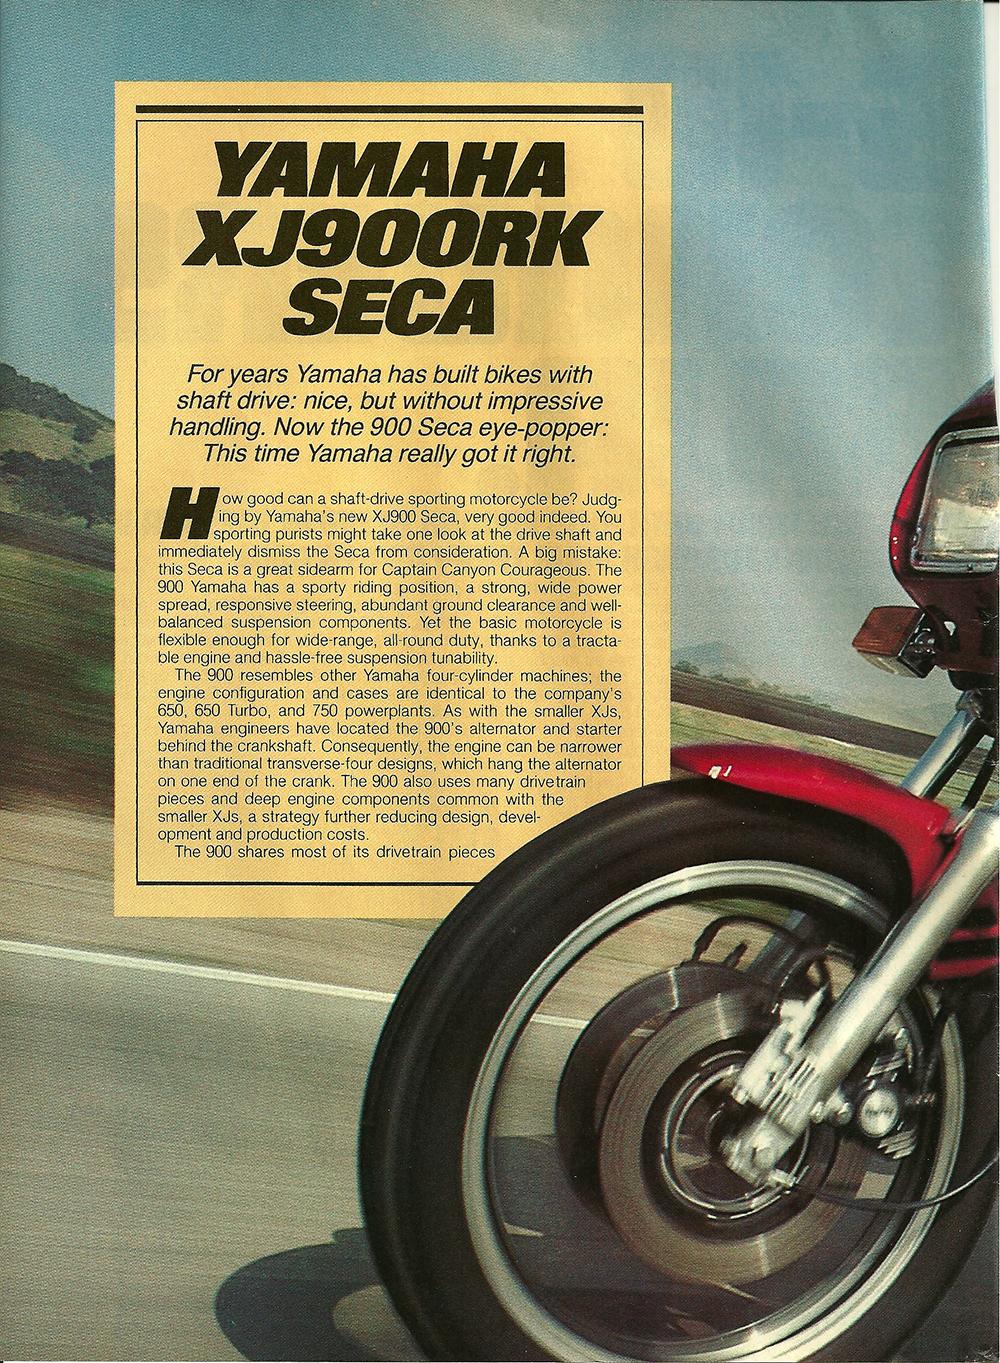 1983 Yamaha XJ900RK Seca road test 1.jpg